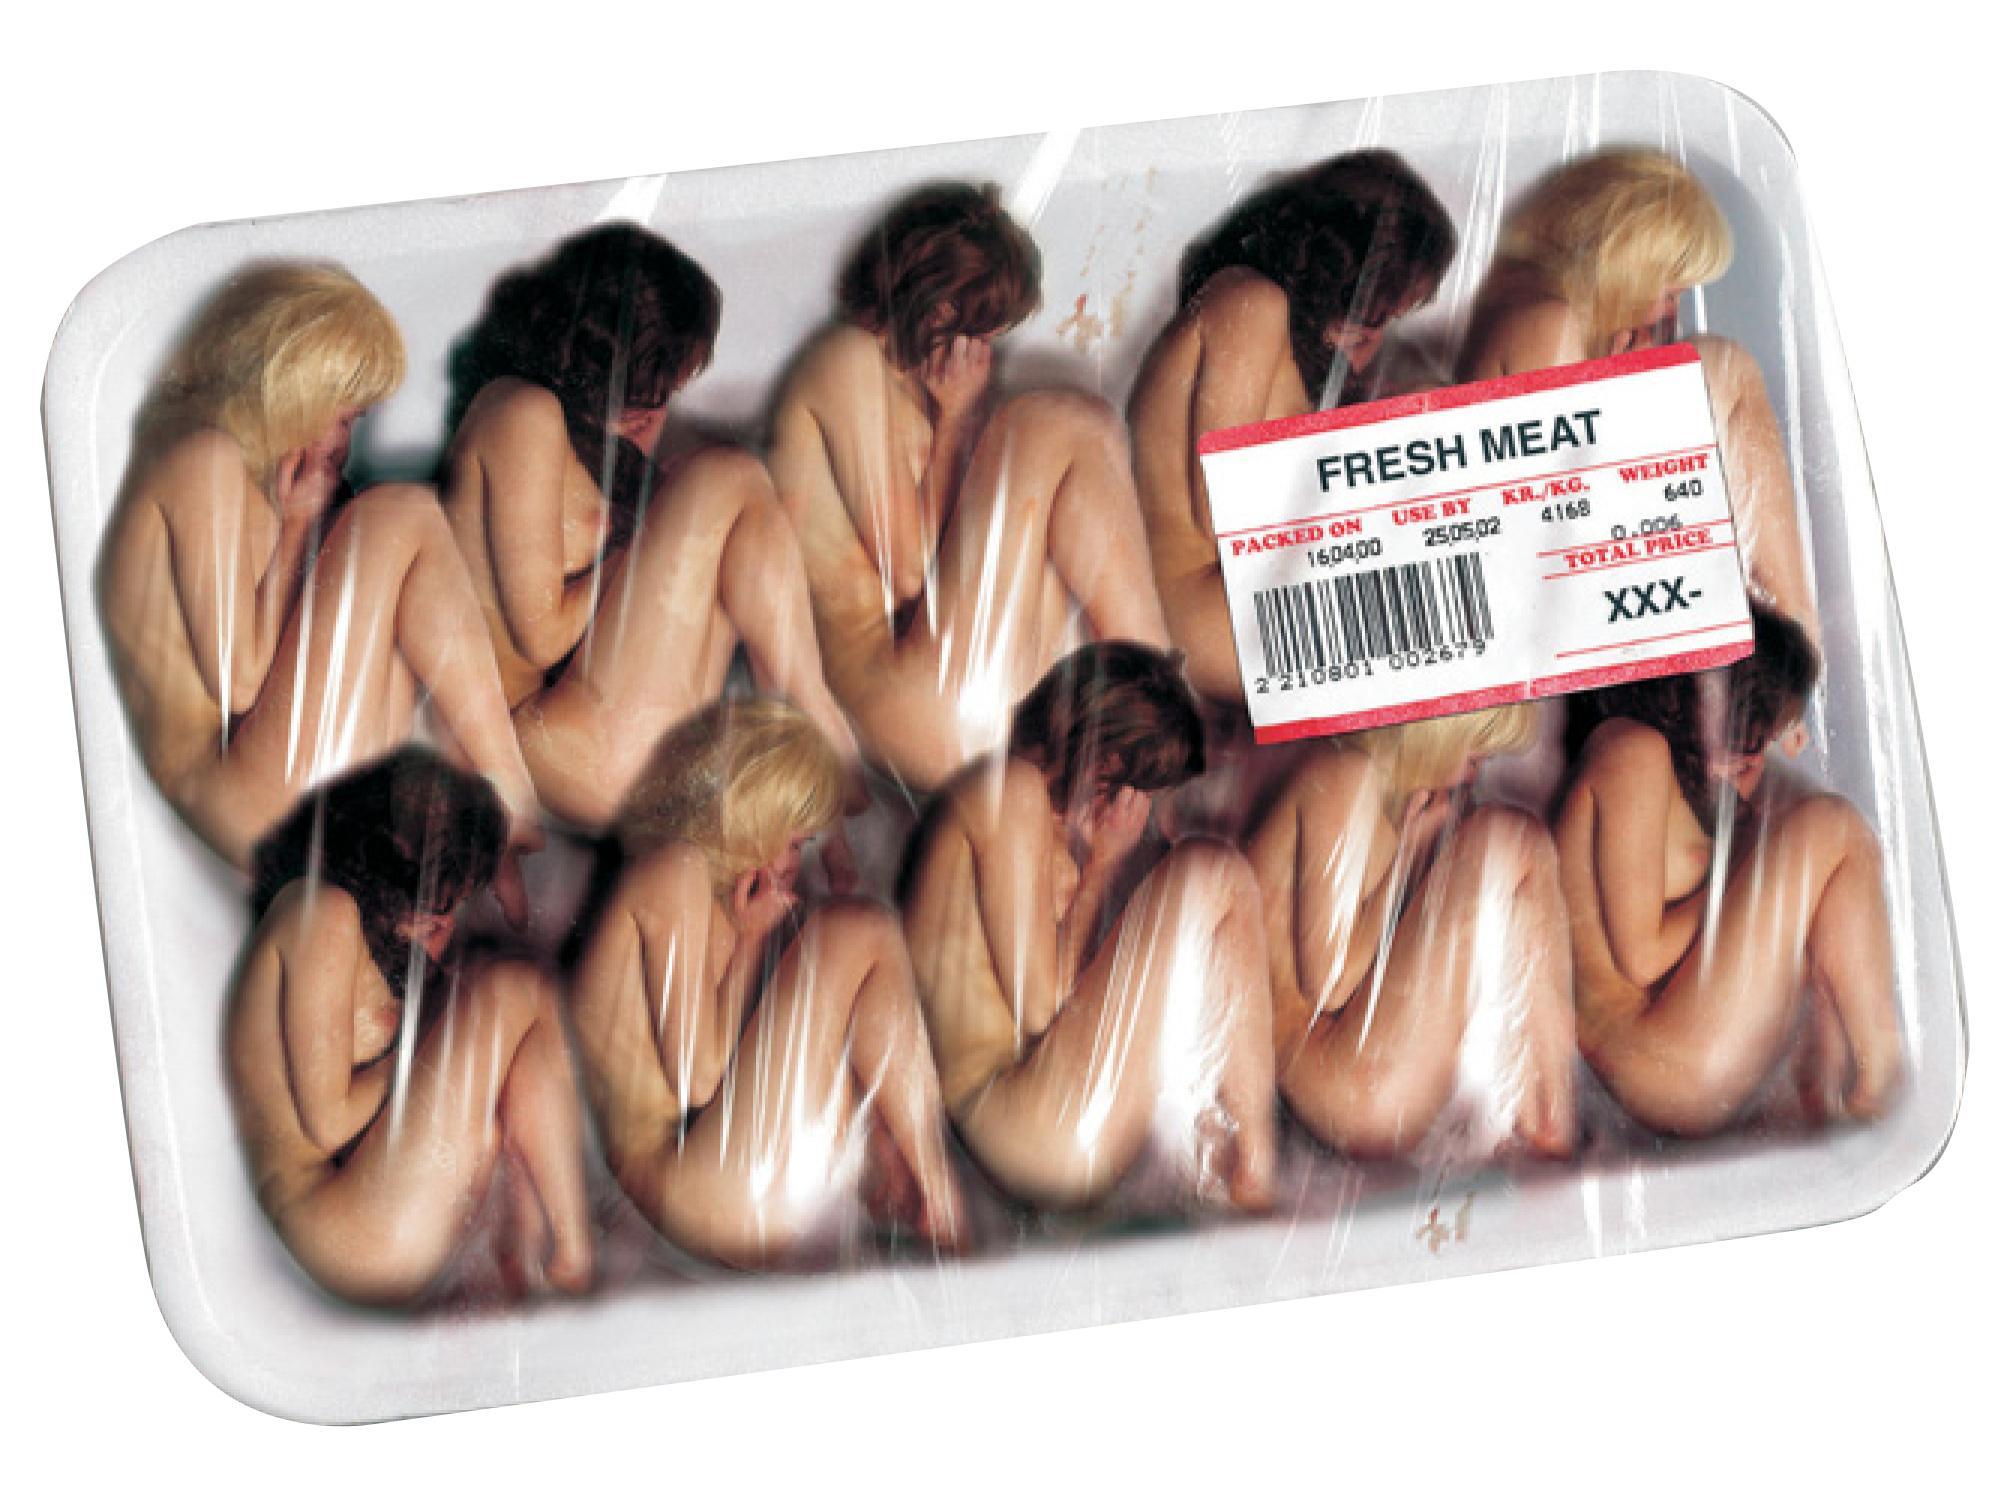 Секс туретский бесплатна 9 фотография